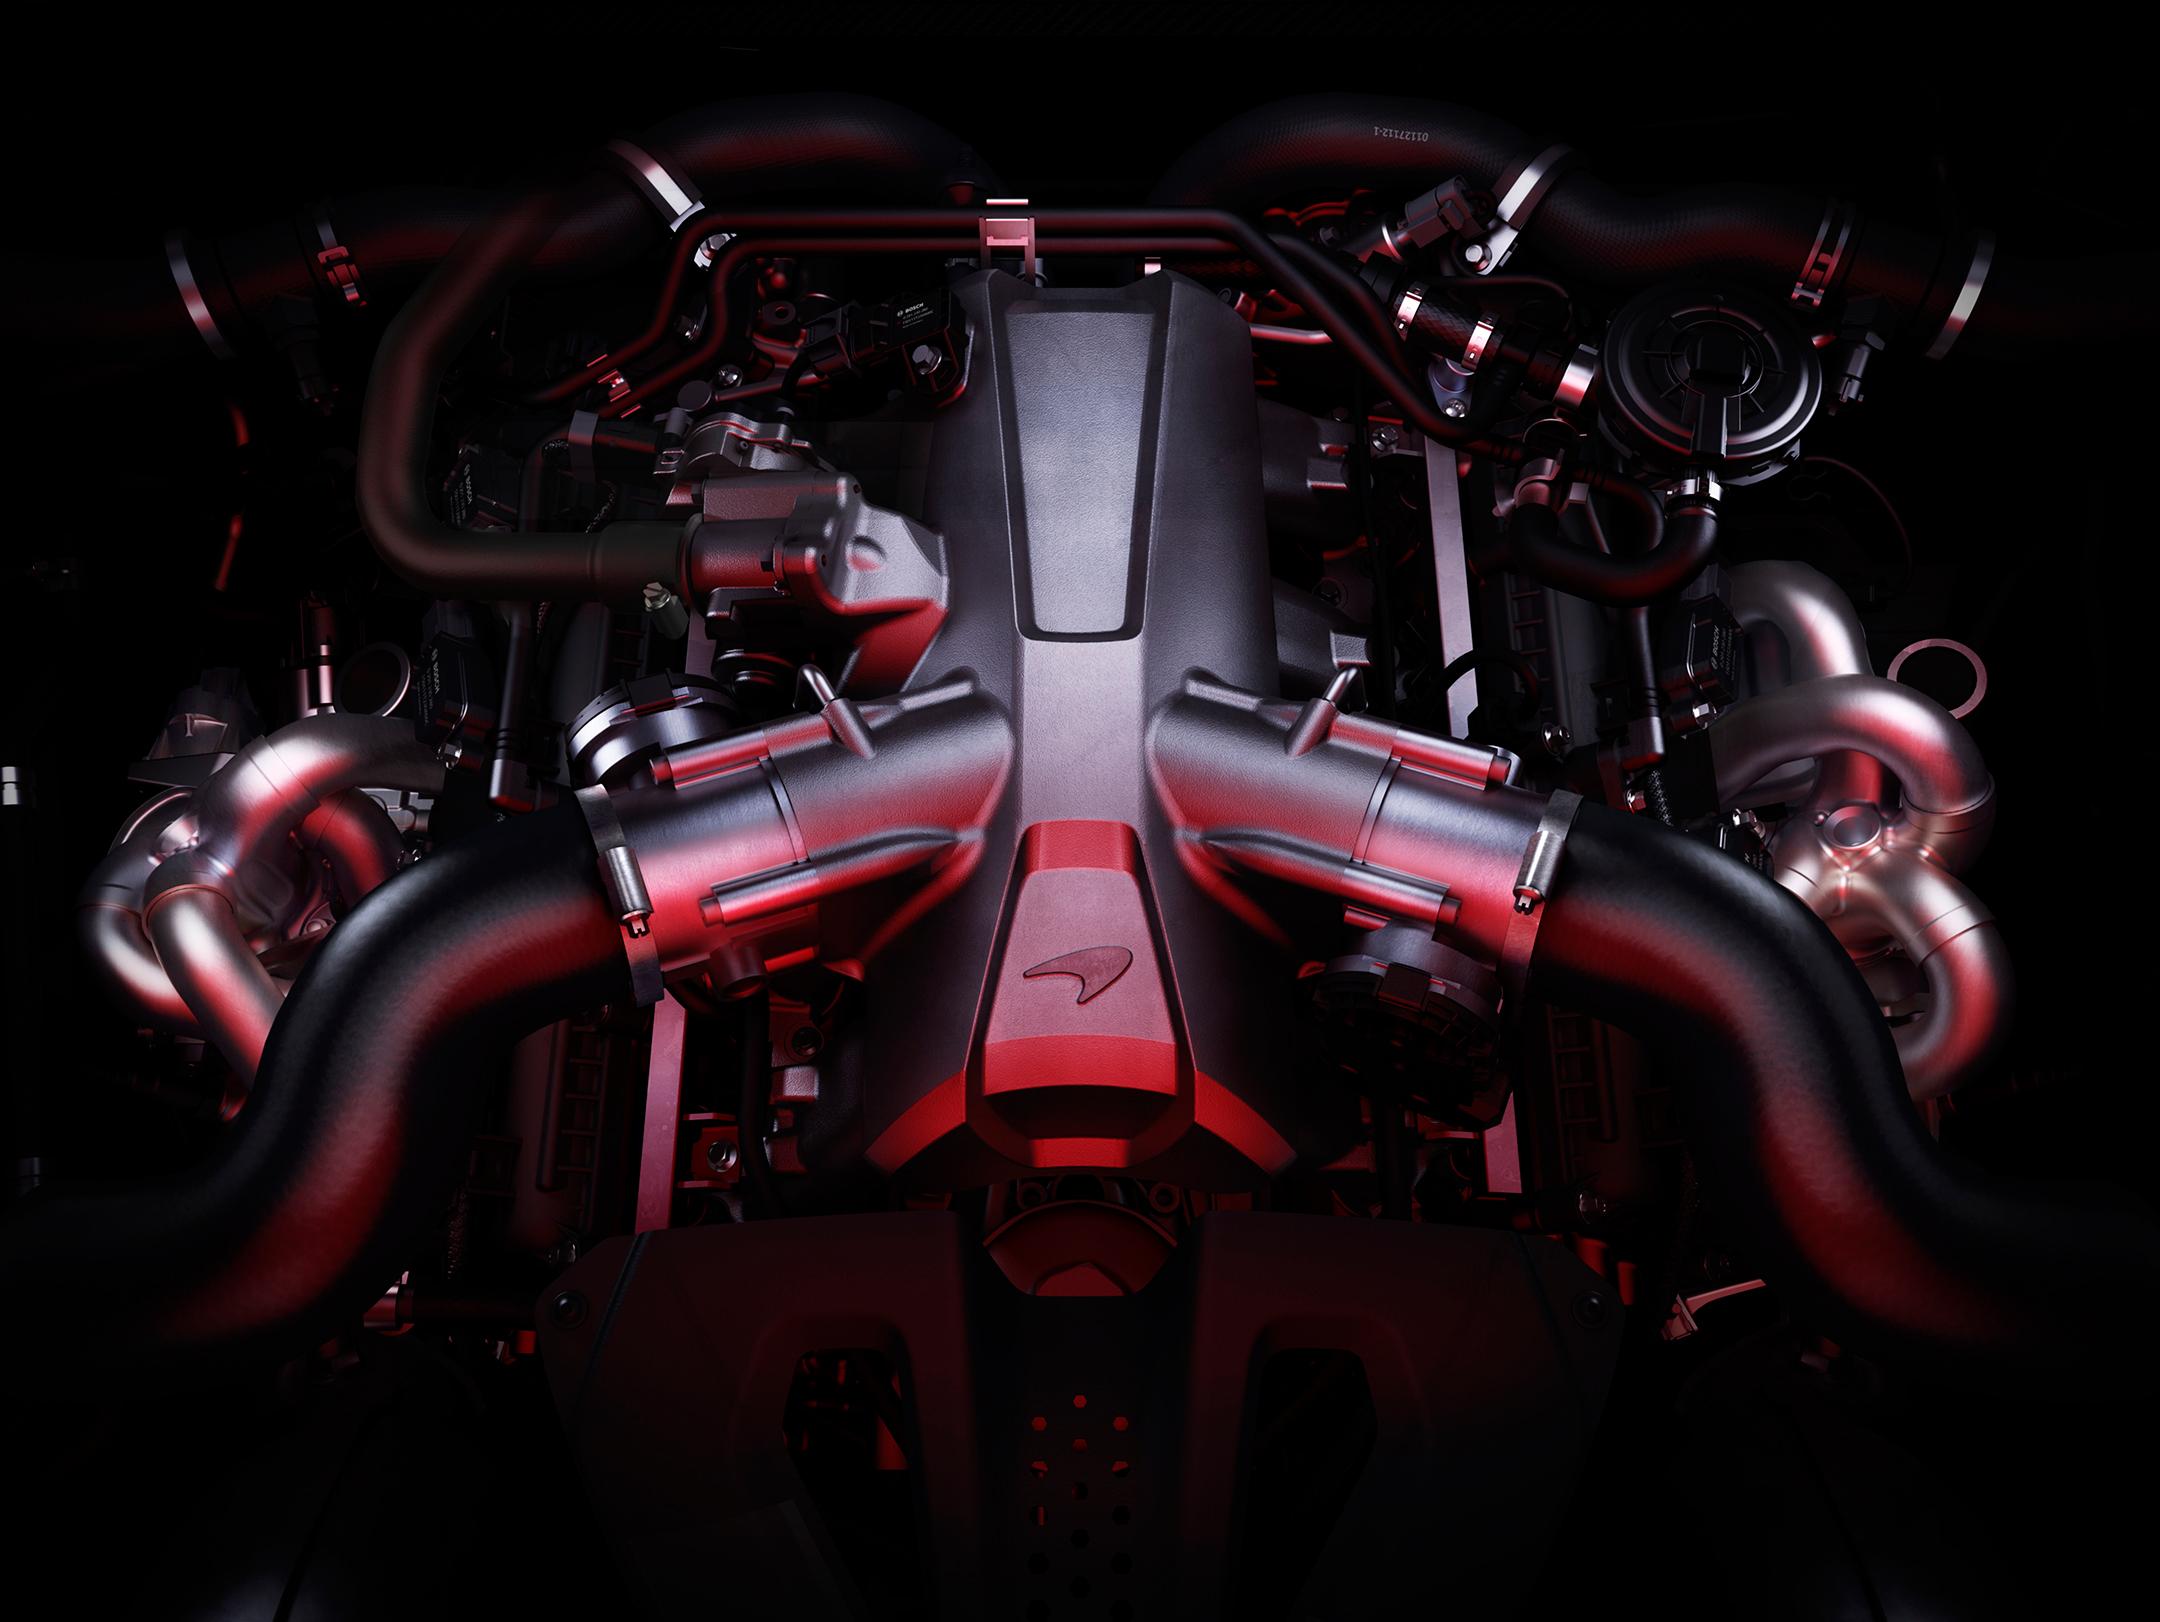 McLaren 720S - 2017 - M840T - engine V8 4.0L